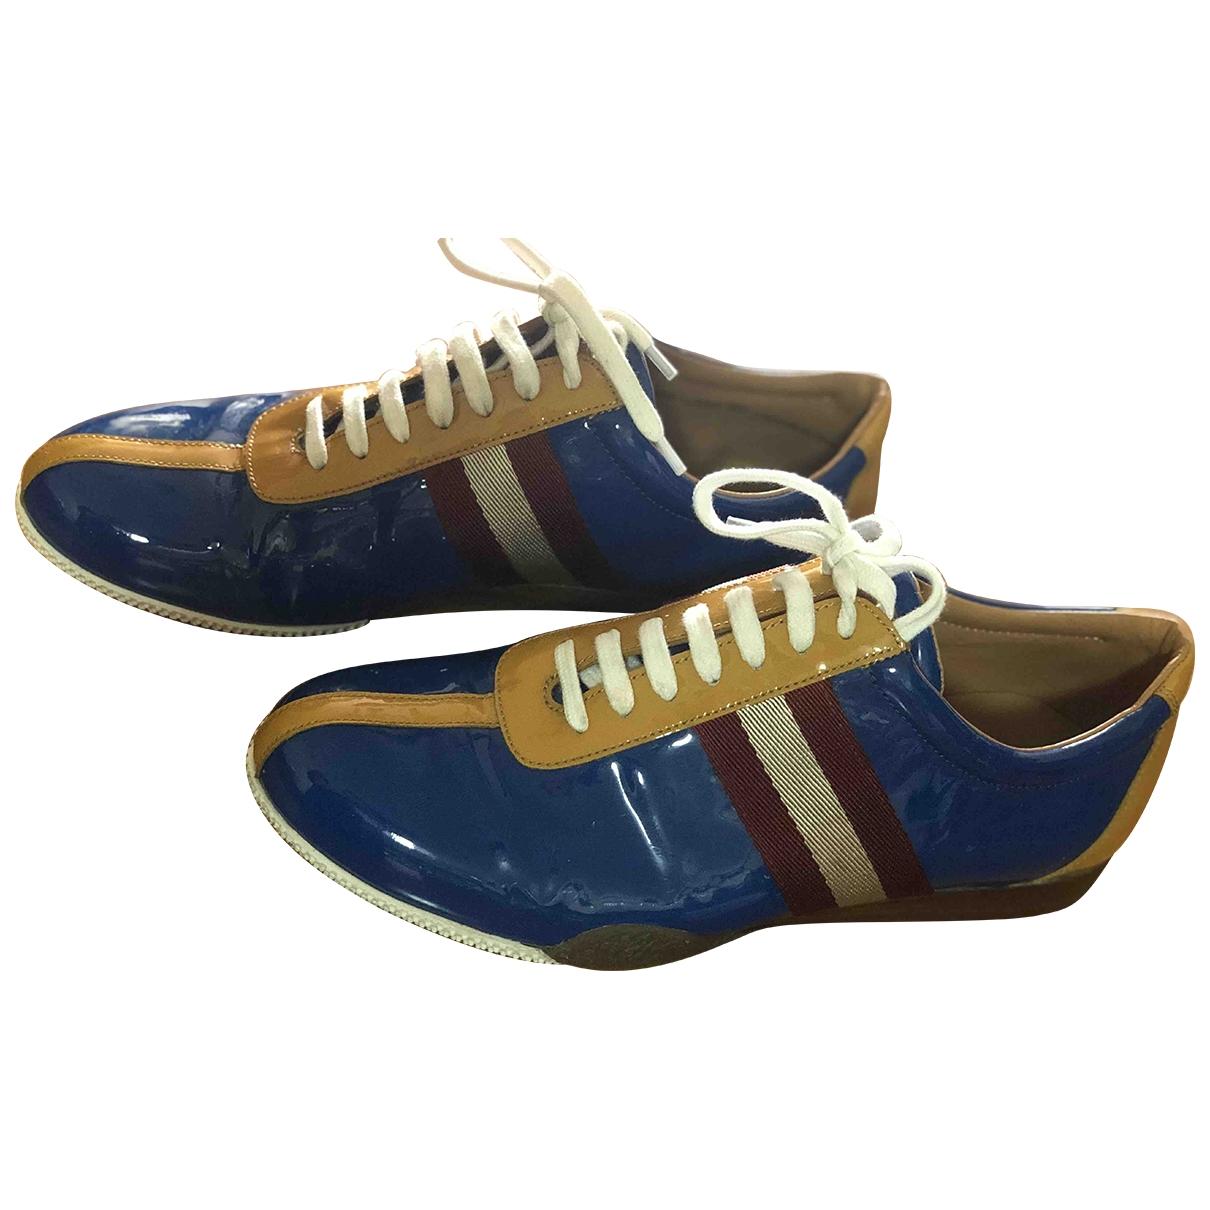 Bally - Baskets   pour homme en cuir verni - bleu